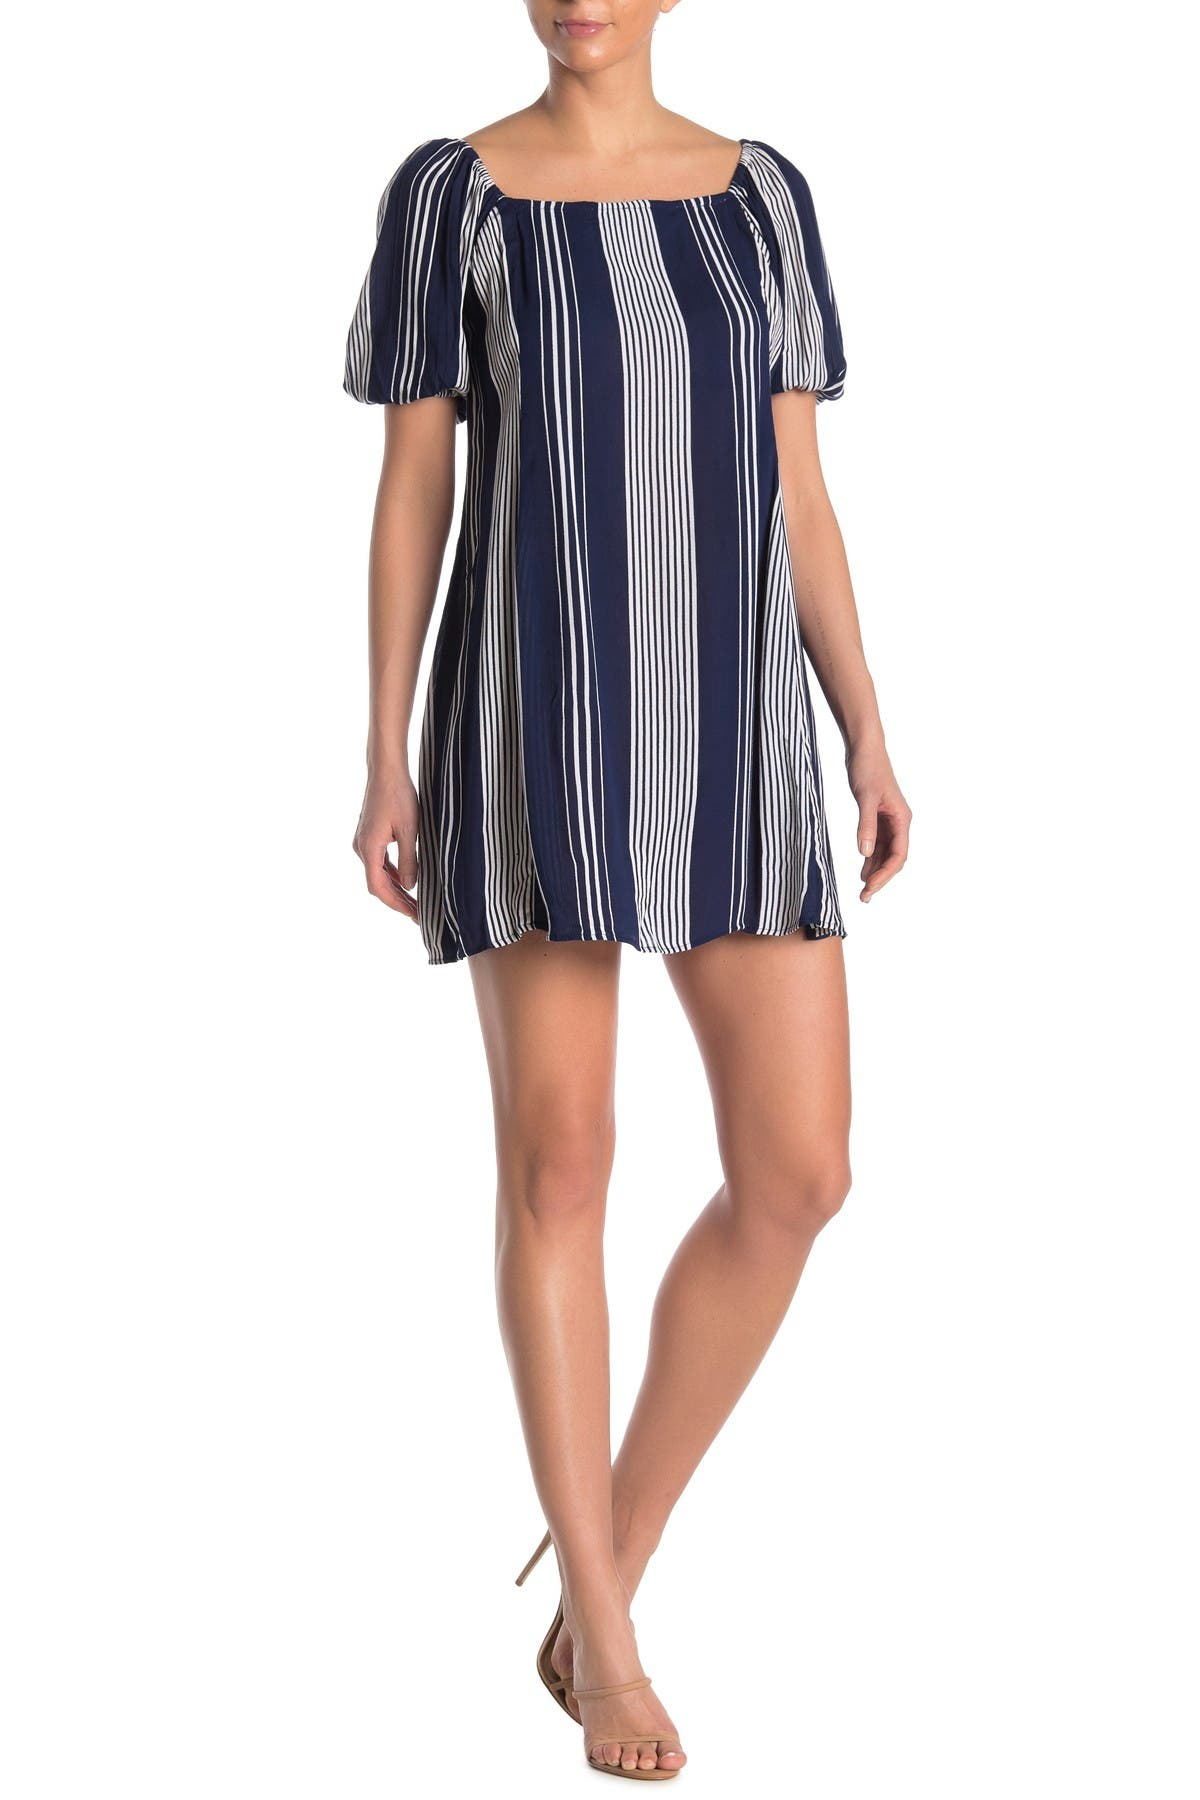 Image of Angie Stripe Puff Sleeve Mini Dress